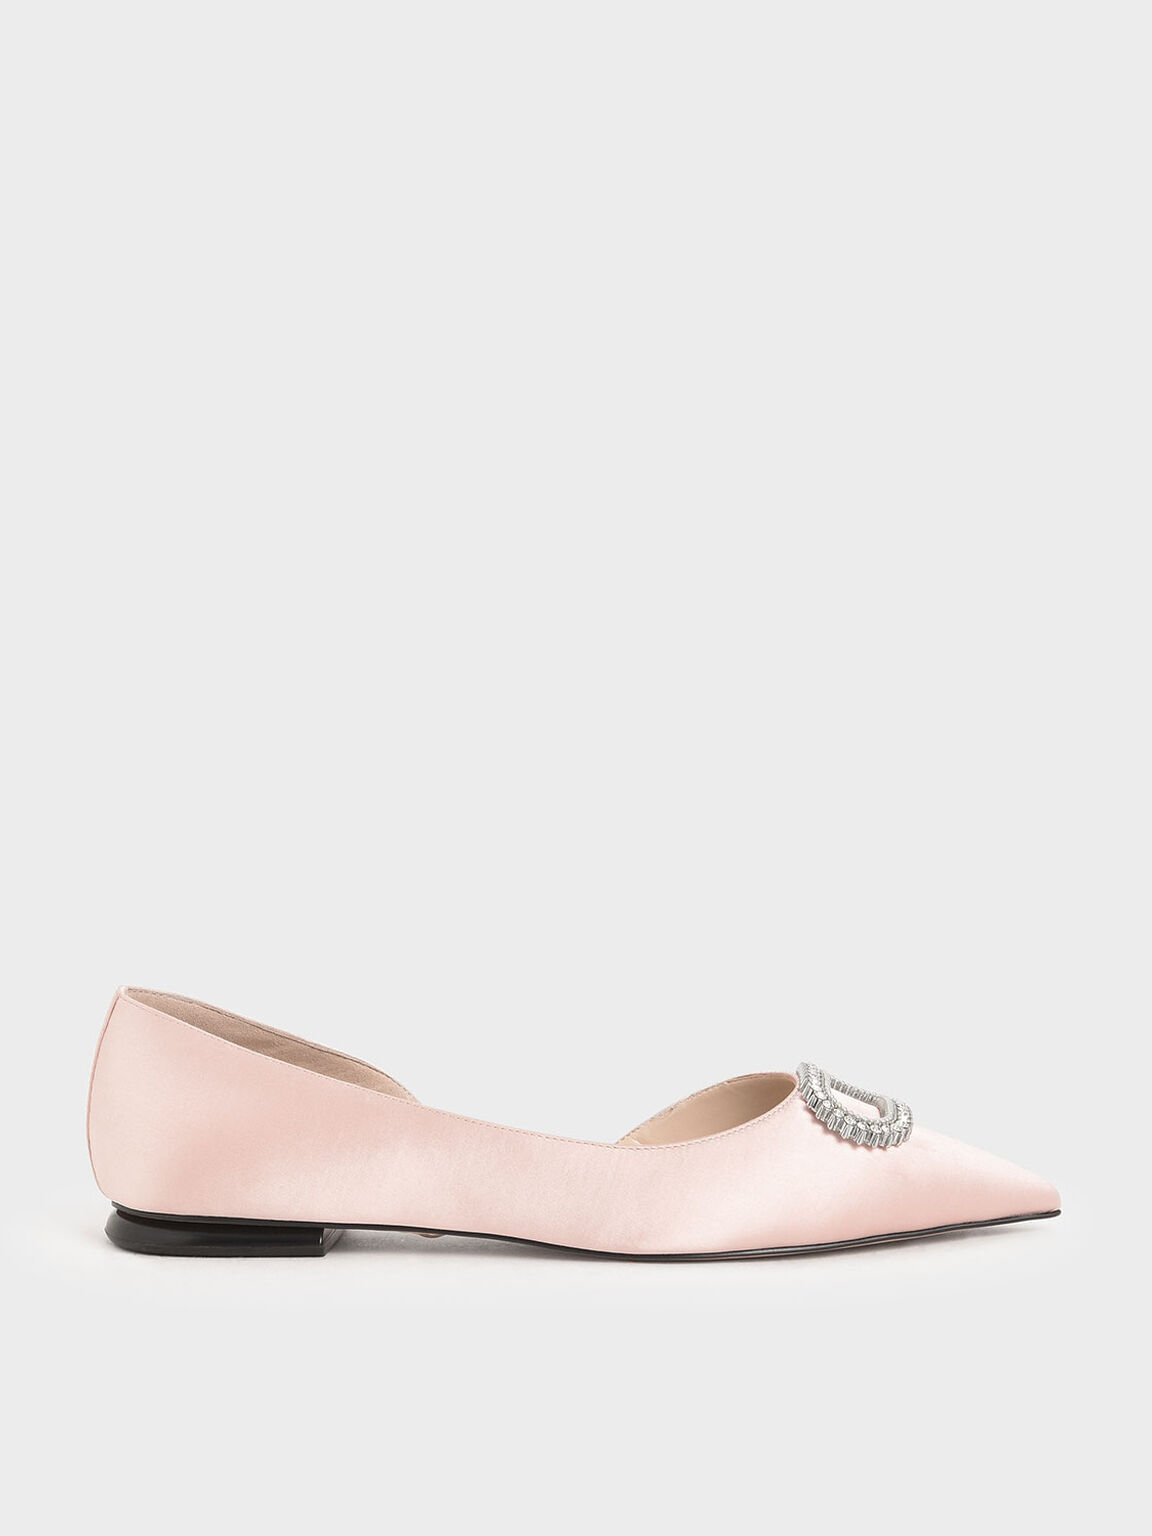 Wedding Collection: Embellished Satin Ballerina Flats, Pink, hi-res